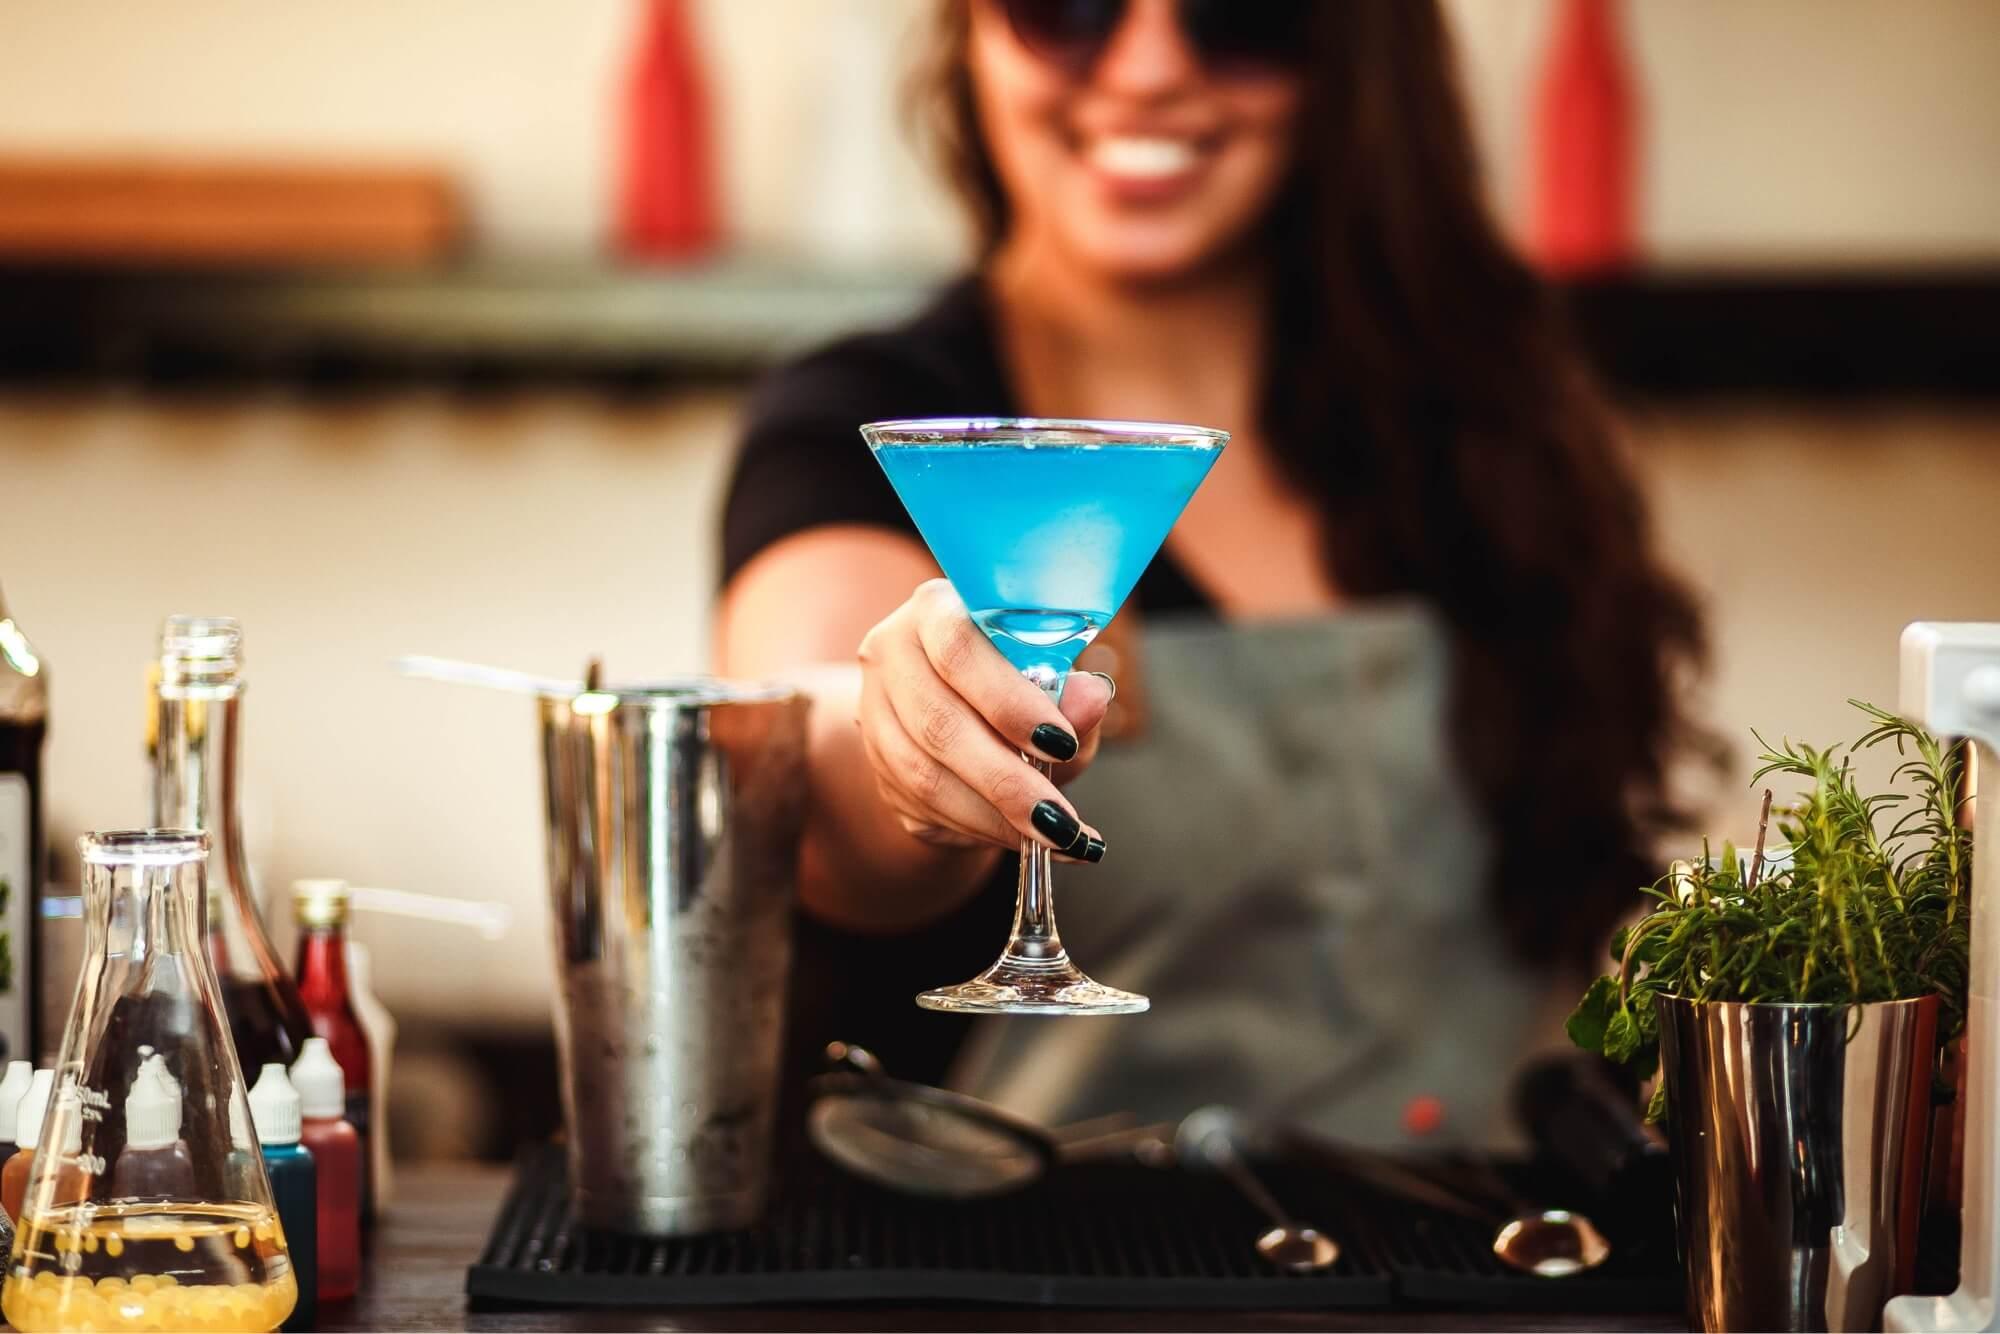 A bartender serving a blue martini at a bar that has a liquor license.